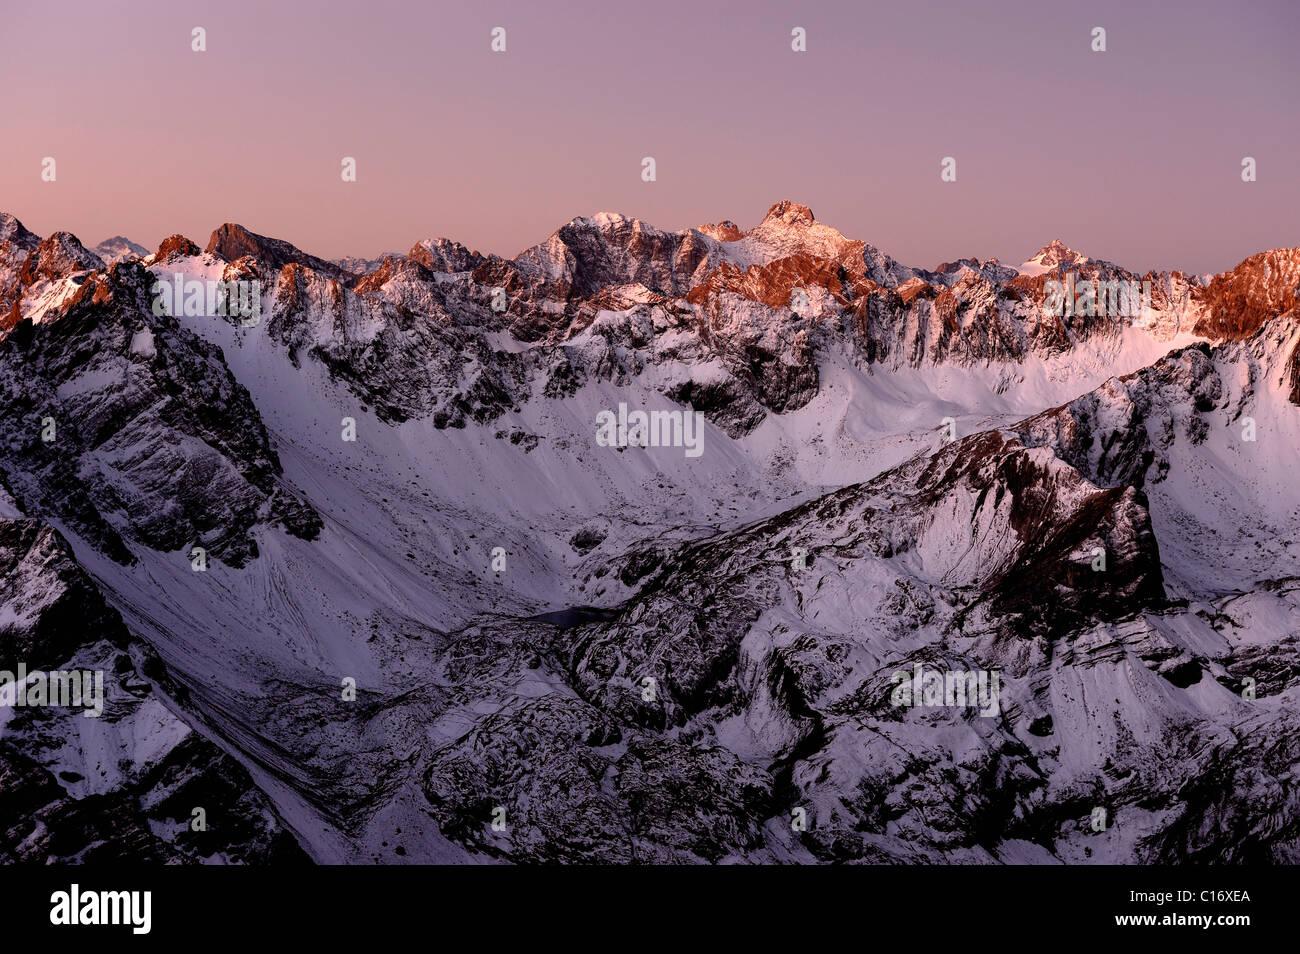 Coperta di neve delle vette alpine di sunrise, Gramais, Lechtal, Reutte, Tirolo, Austria, Europa Immagini Stock